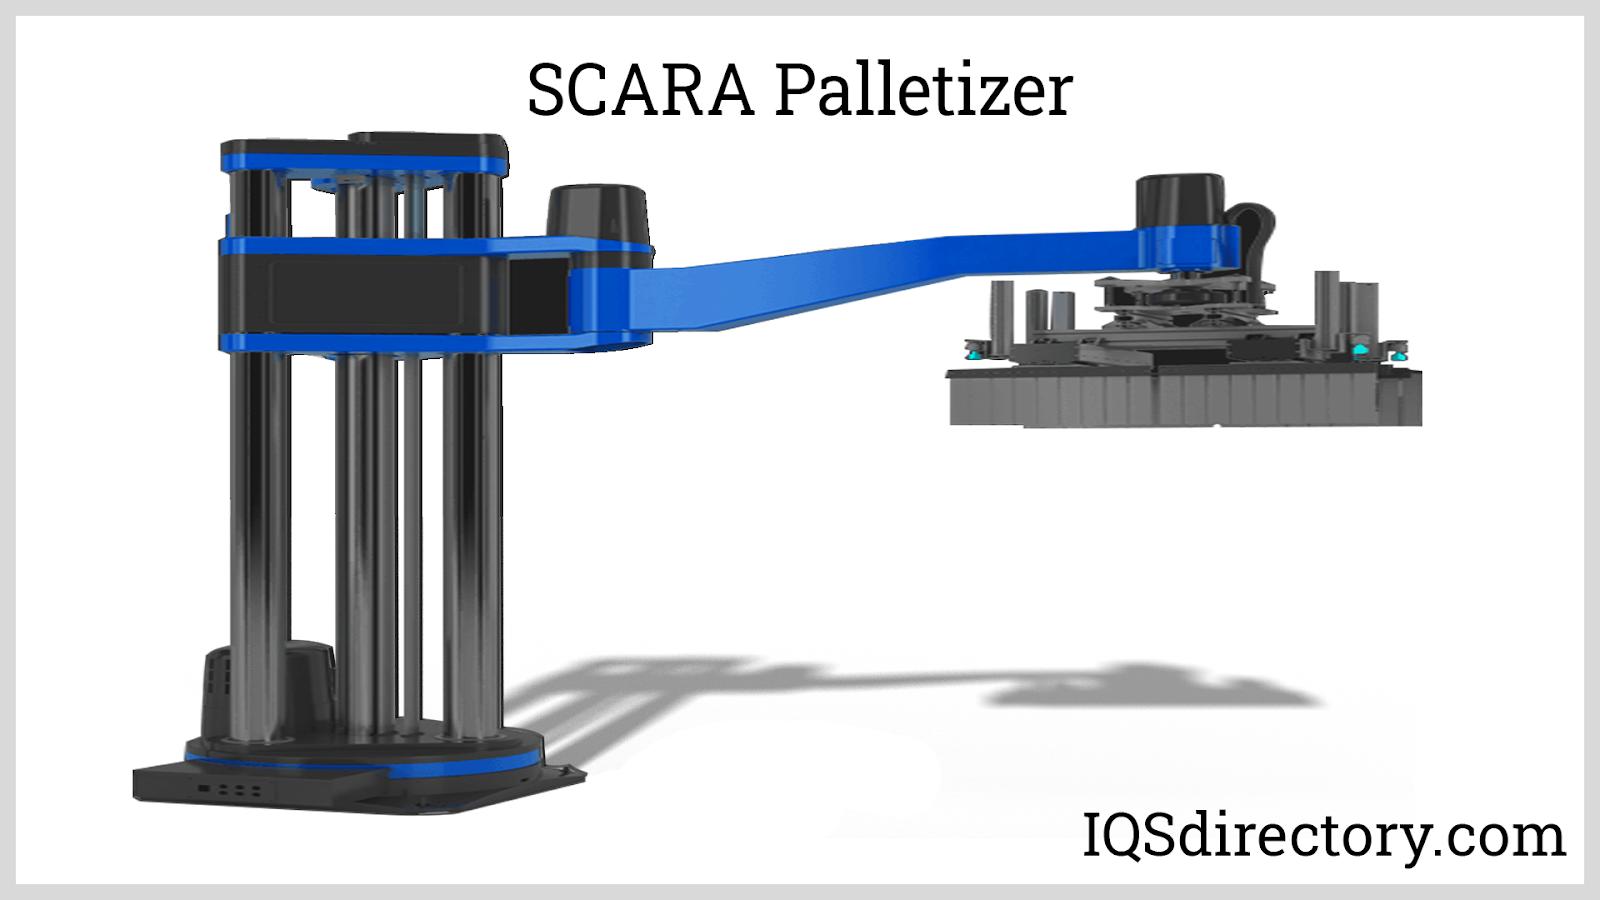 SCARA Palletizer